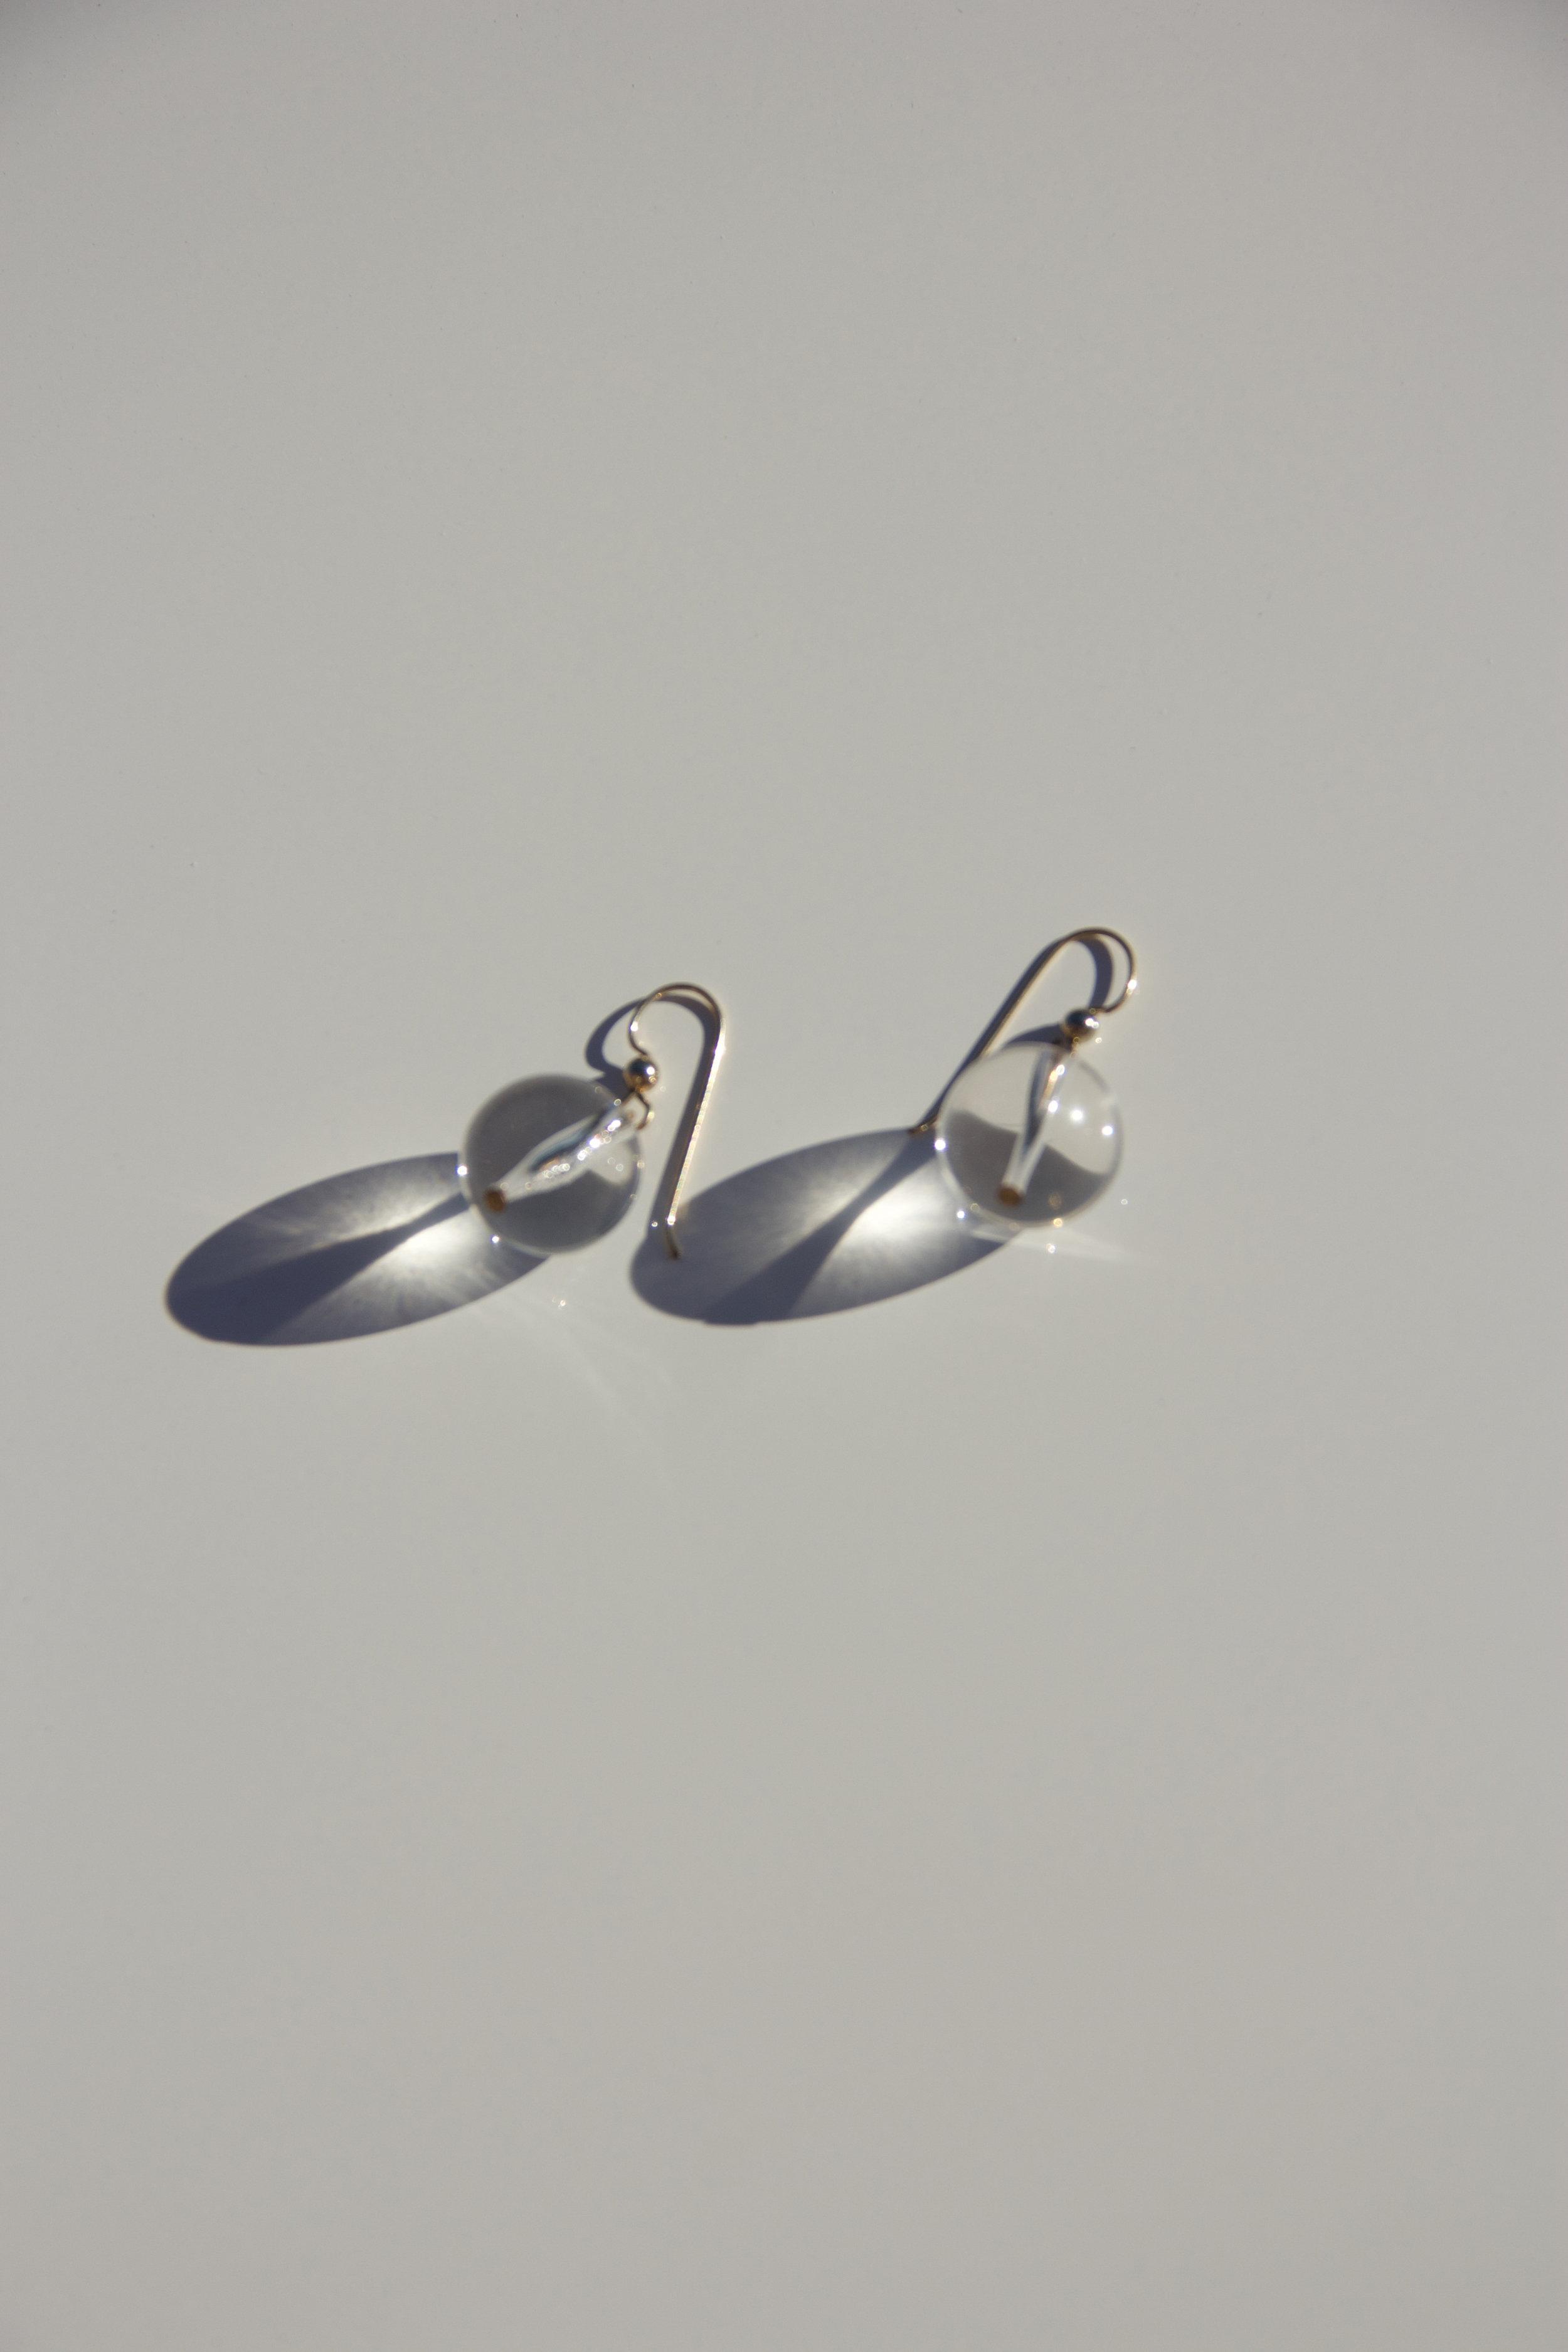 lucite sphere earrings 4.jpg